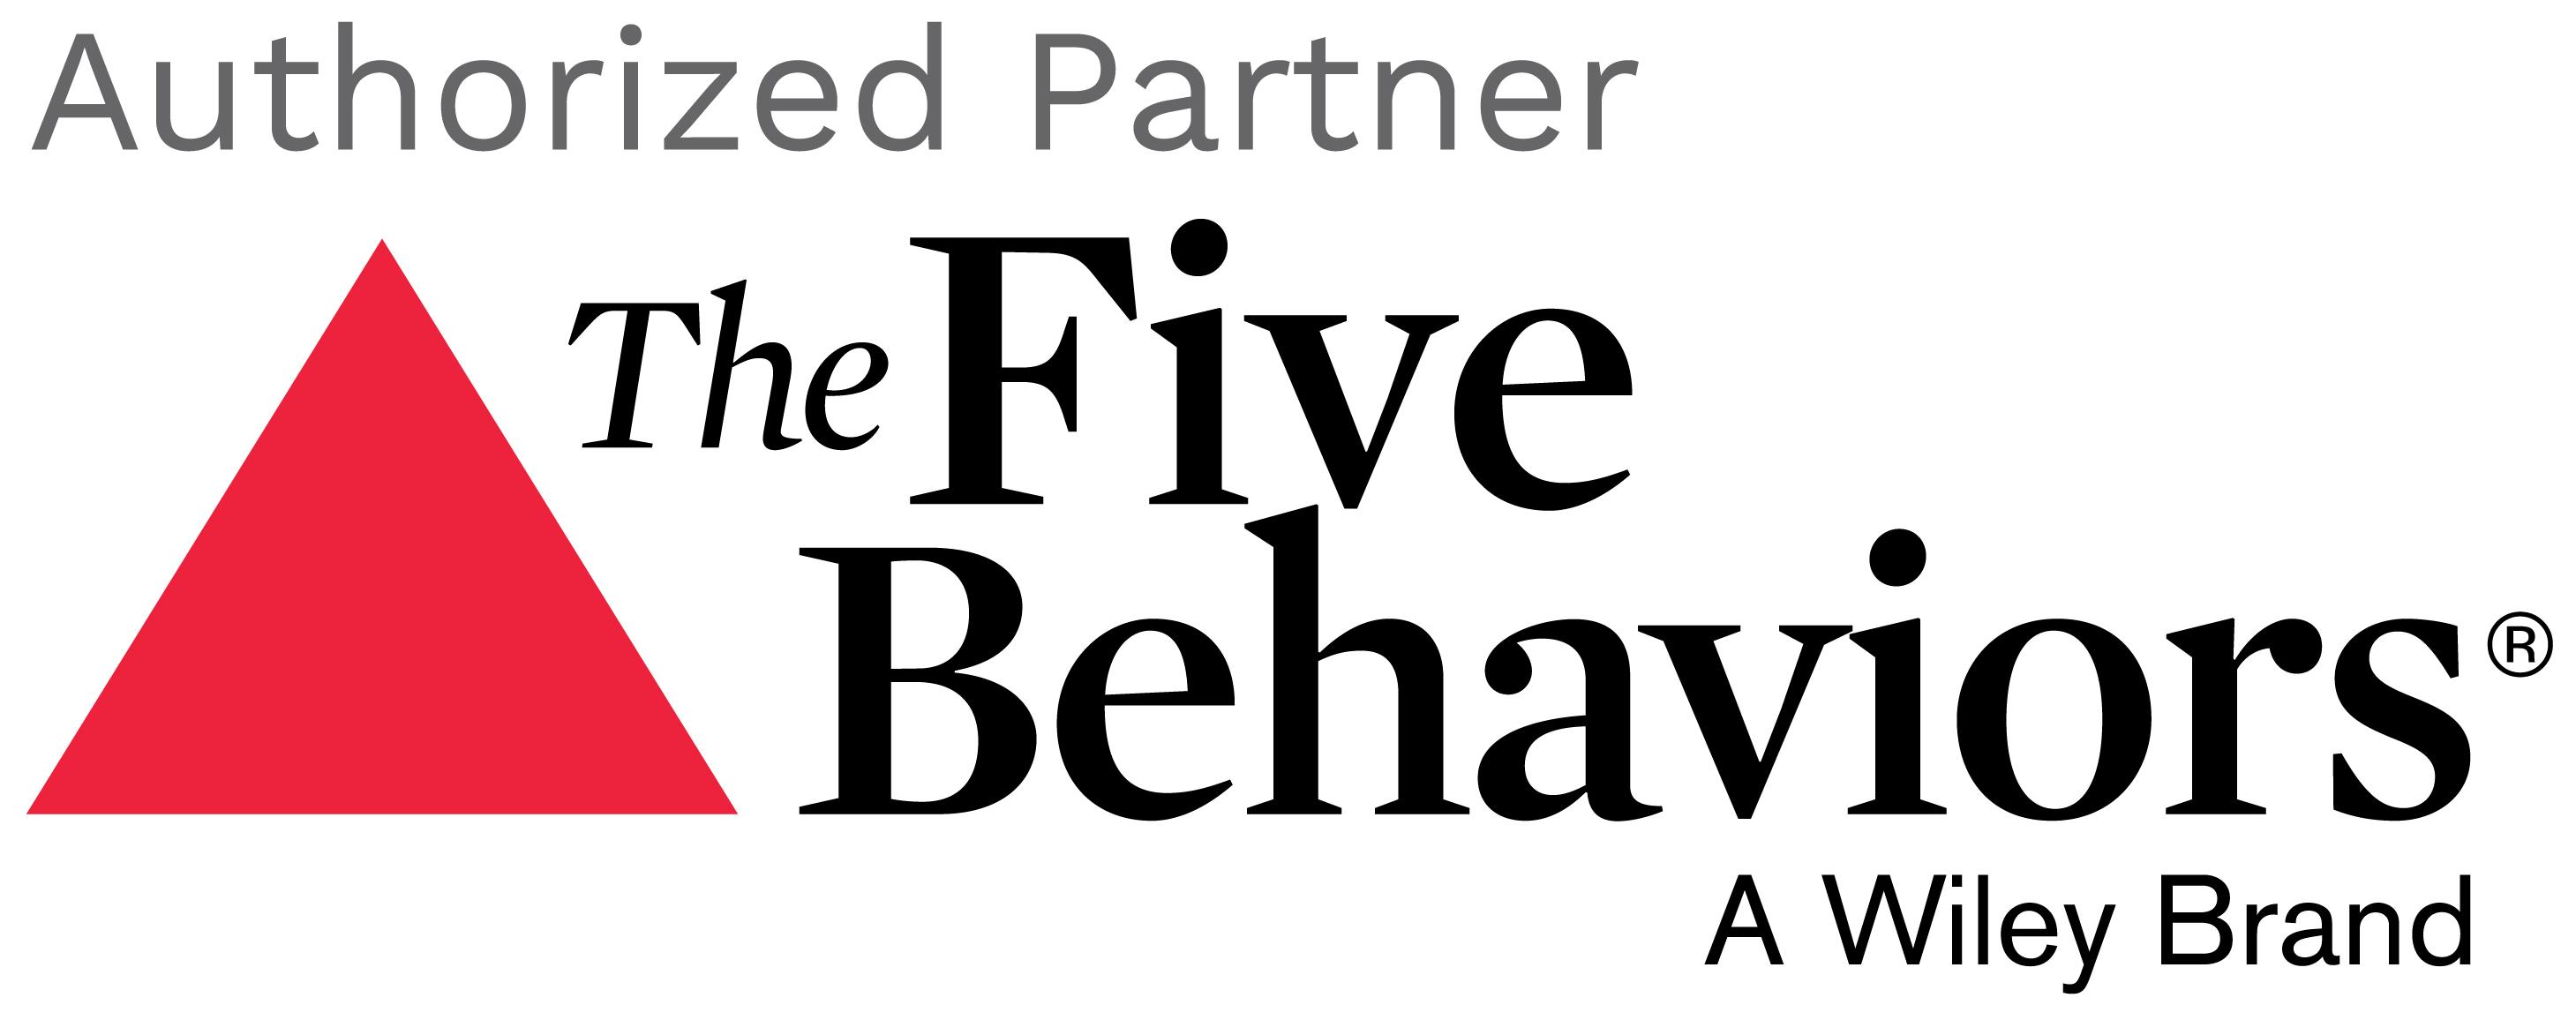 Five Behaviours Authorized Partner